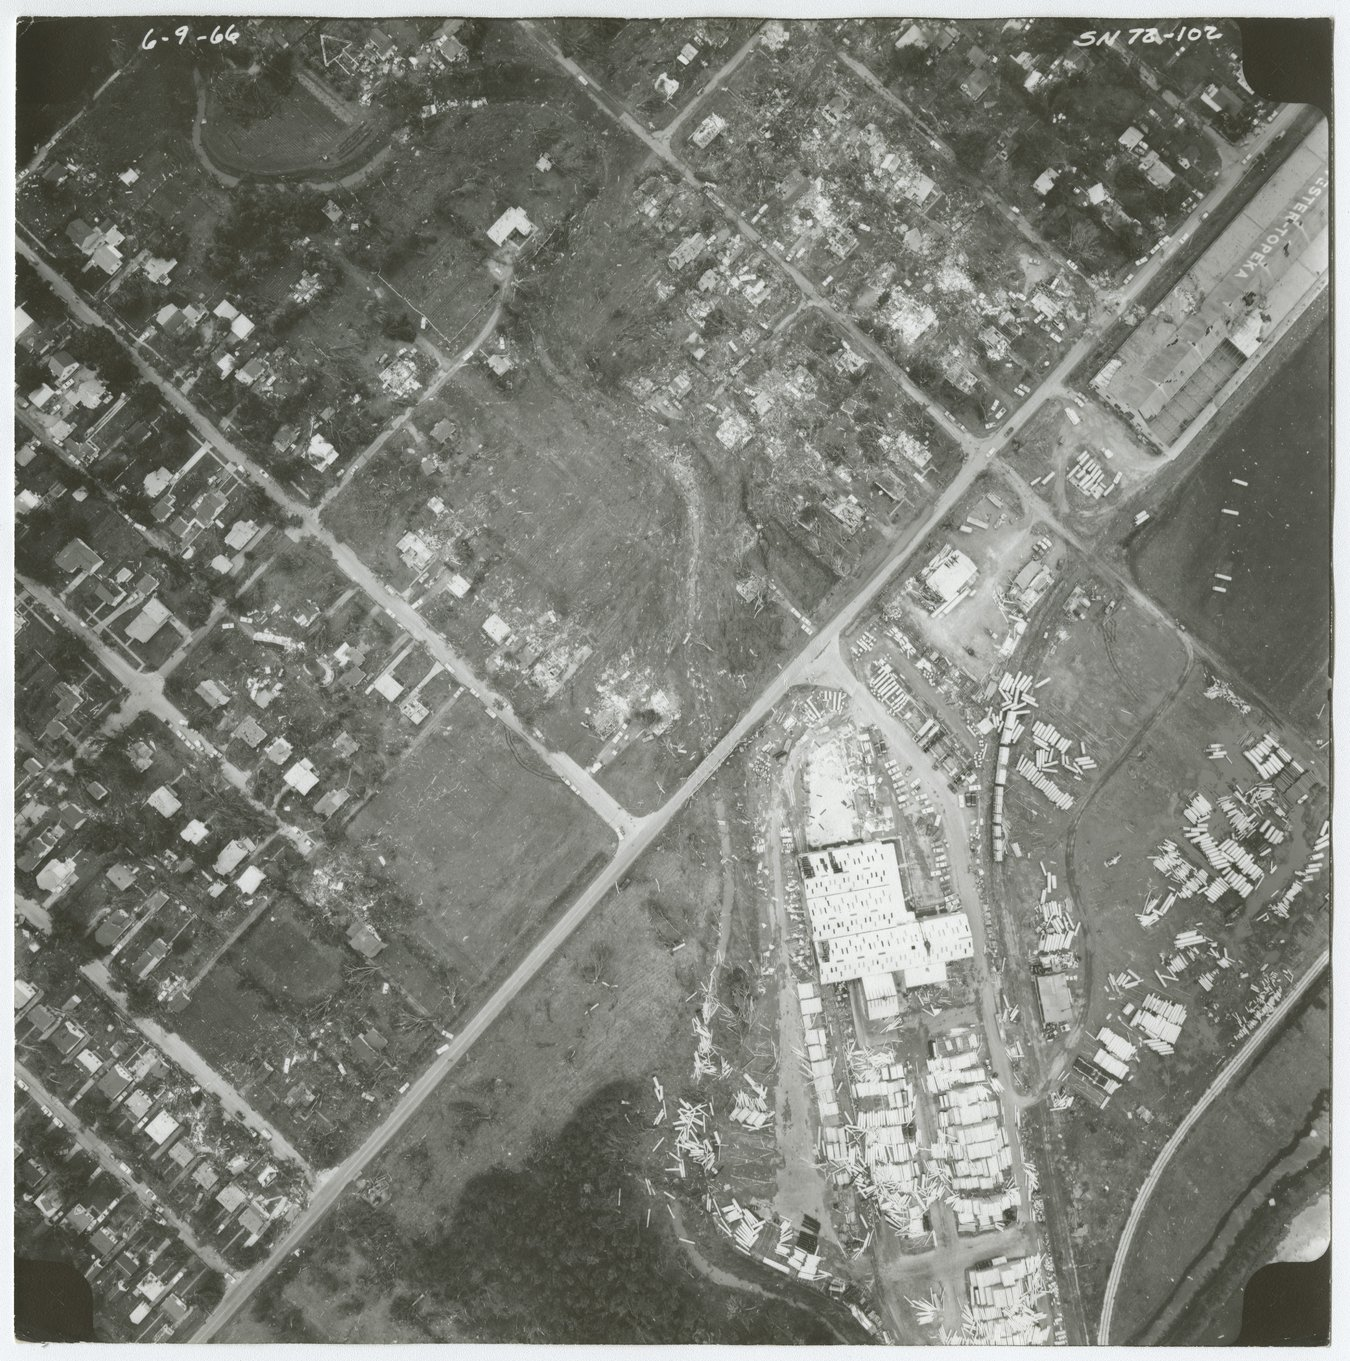 Aerial view of Shawnee County, Kansas - 1